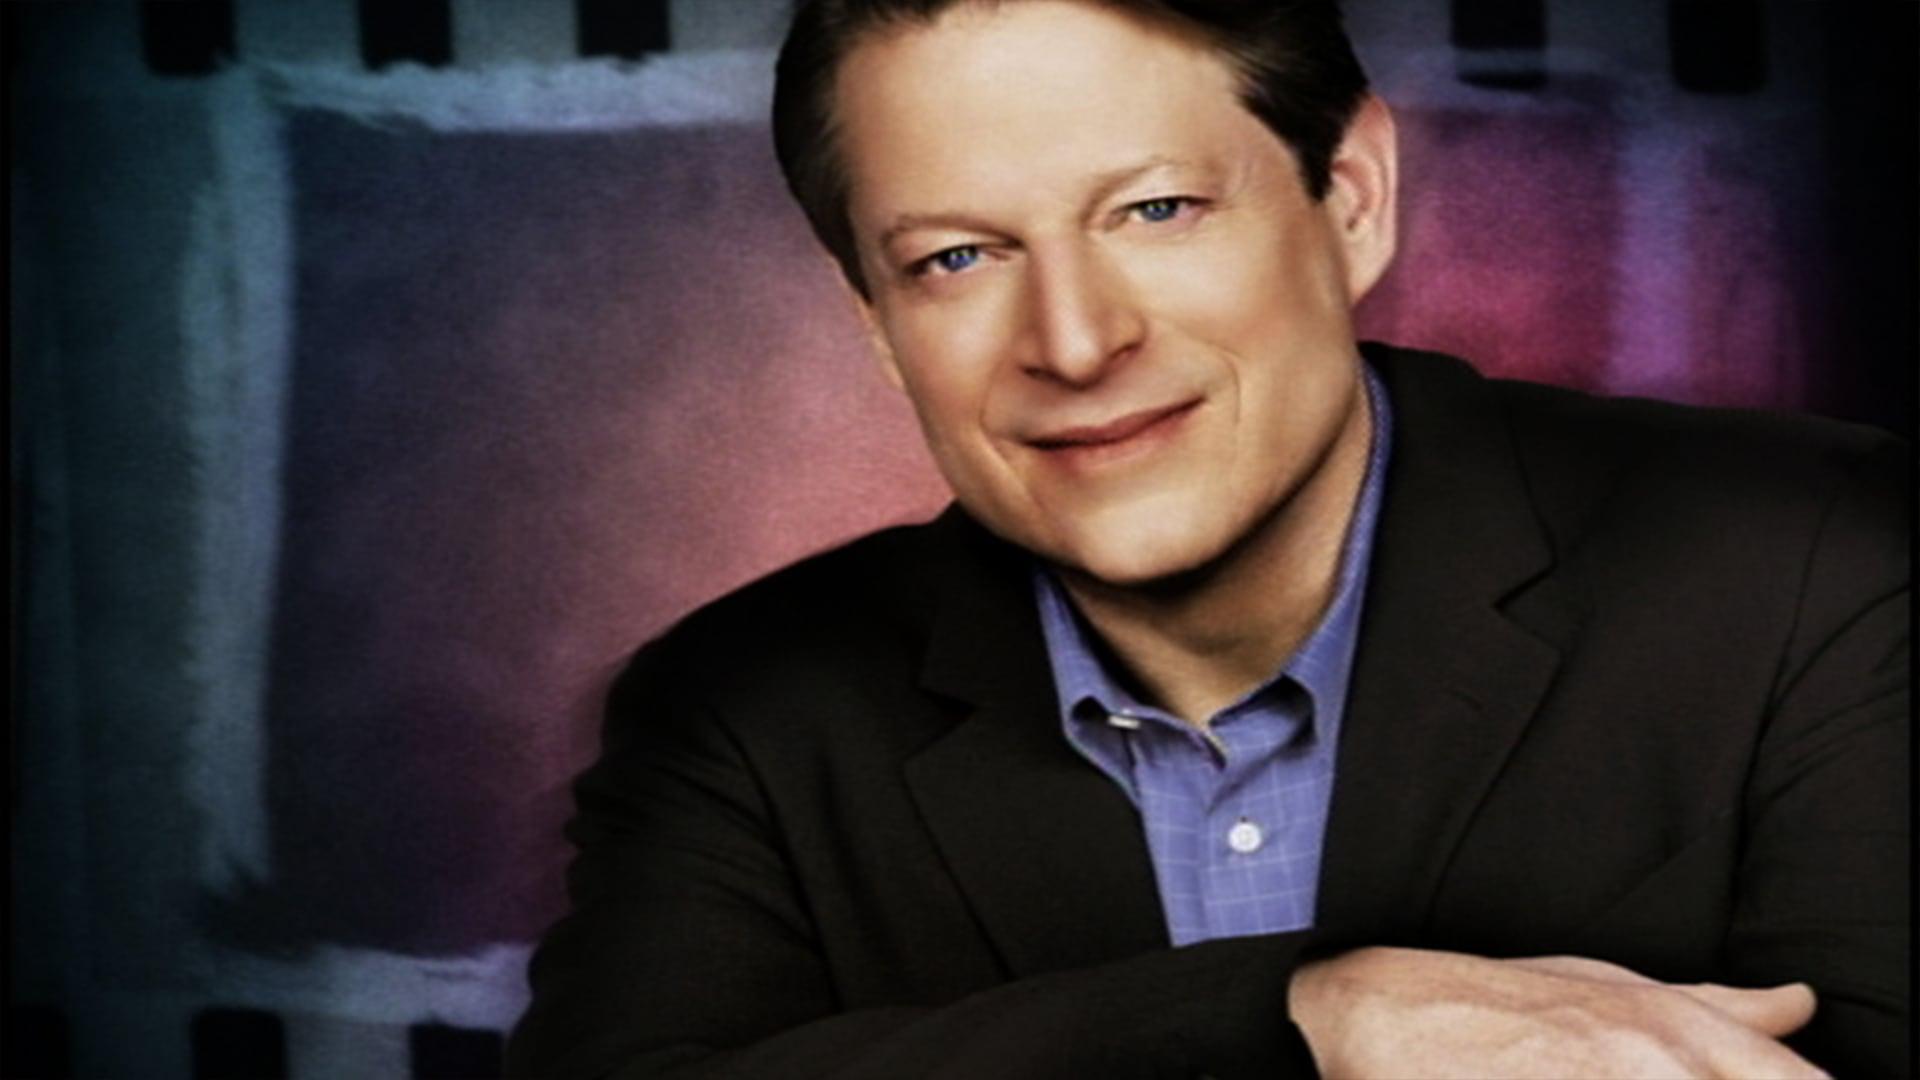 Al Gore: December 14, 2002